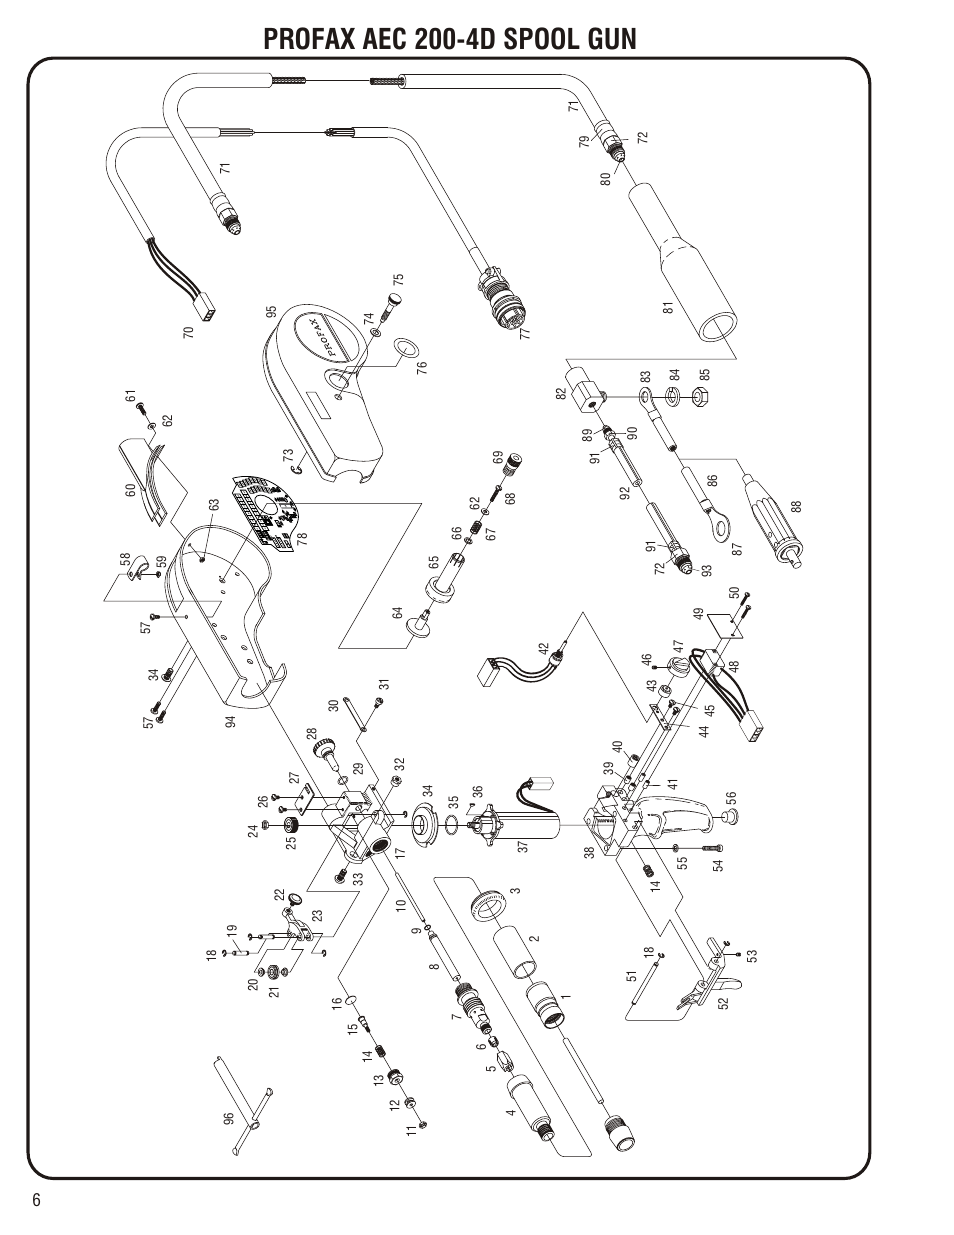 Replacement parts for profax aec 200-4d spool gun, Profax